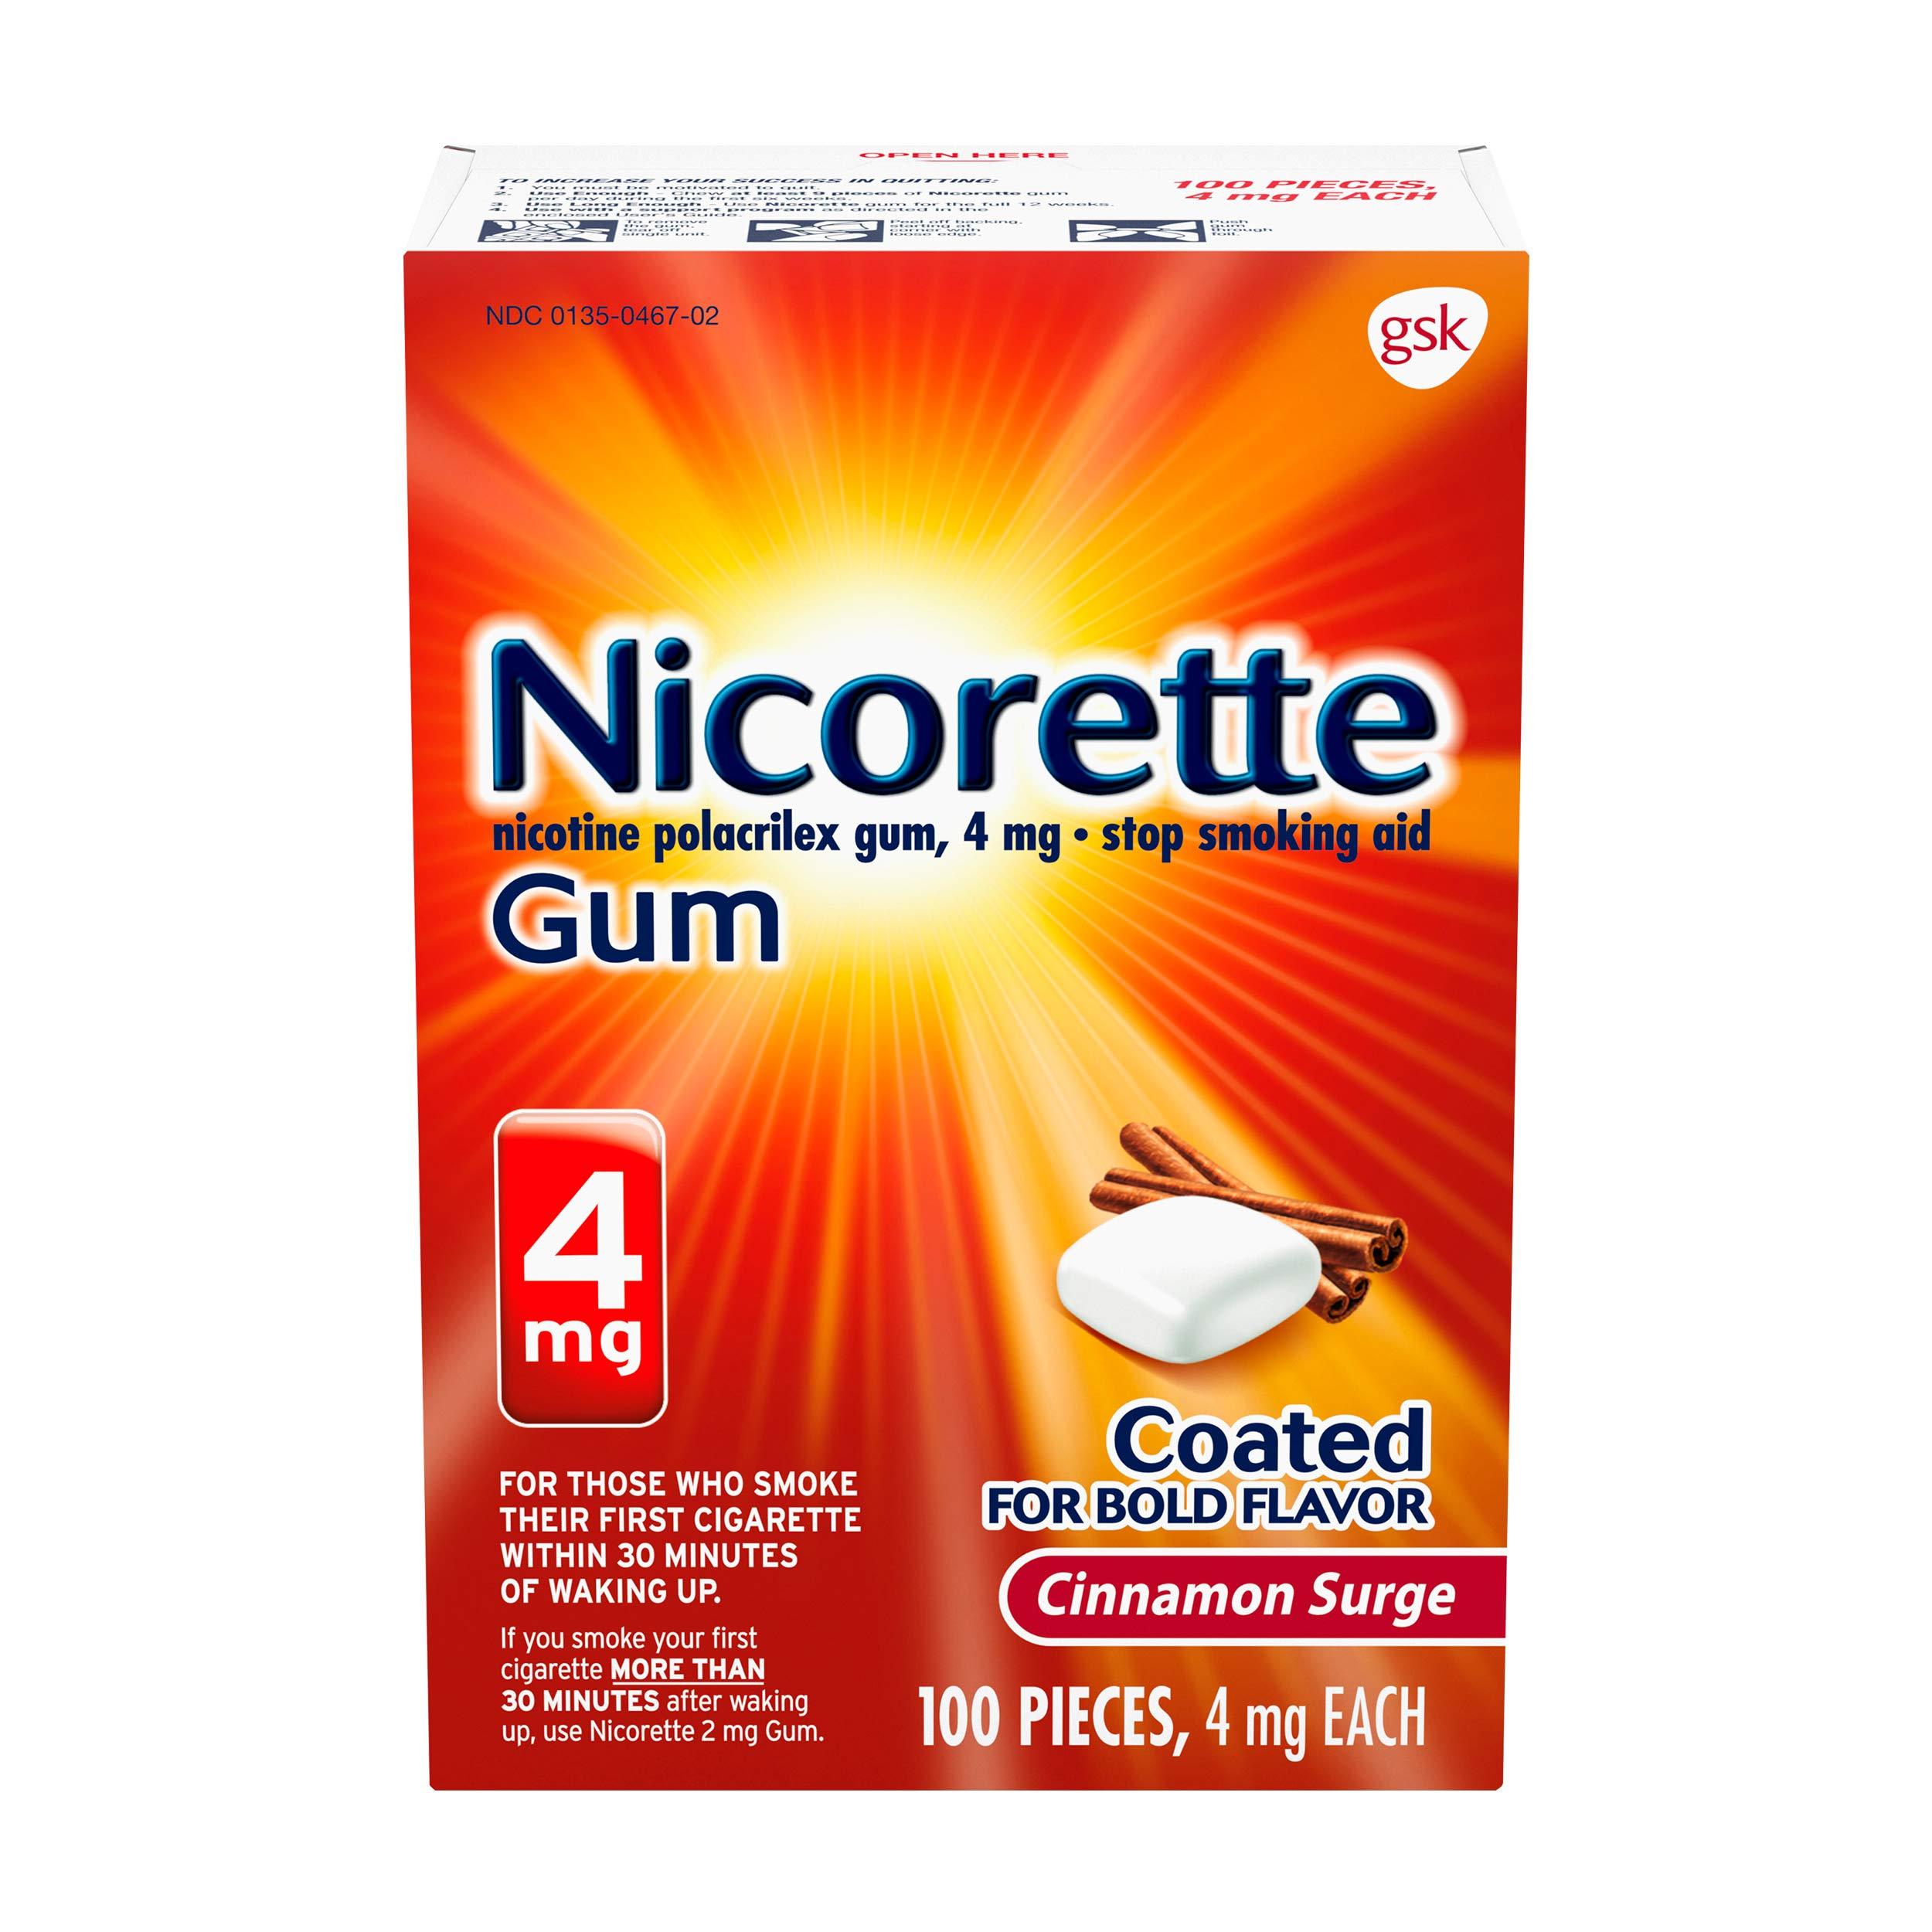 Nicorette Nicotine Gum 4 Milligram Stop Smoking Aid, Red, Cinnamon Surge, 100 Count